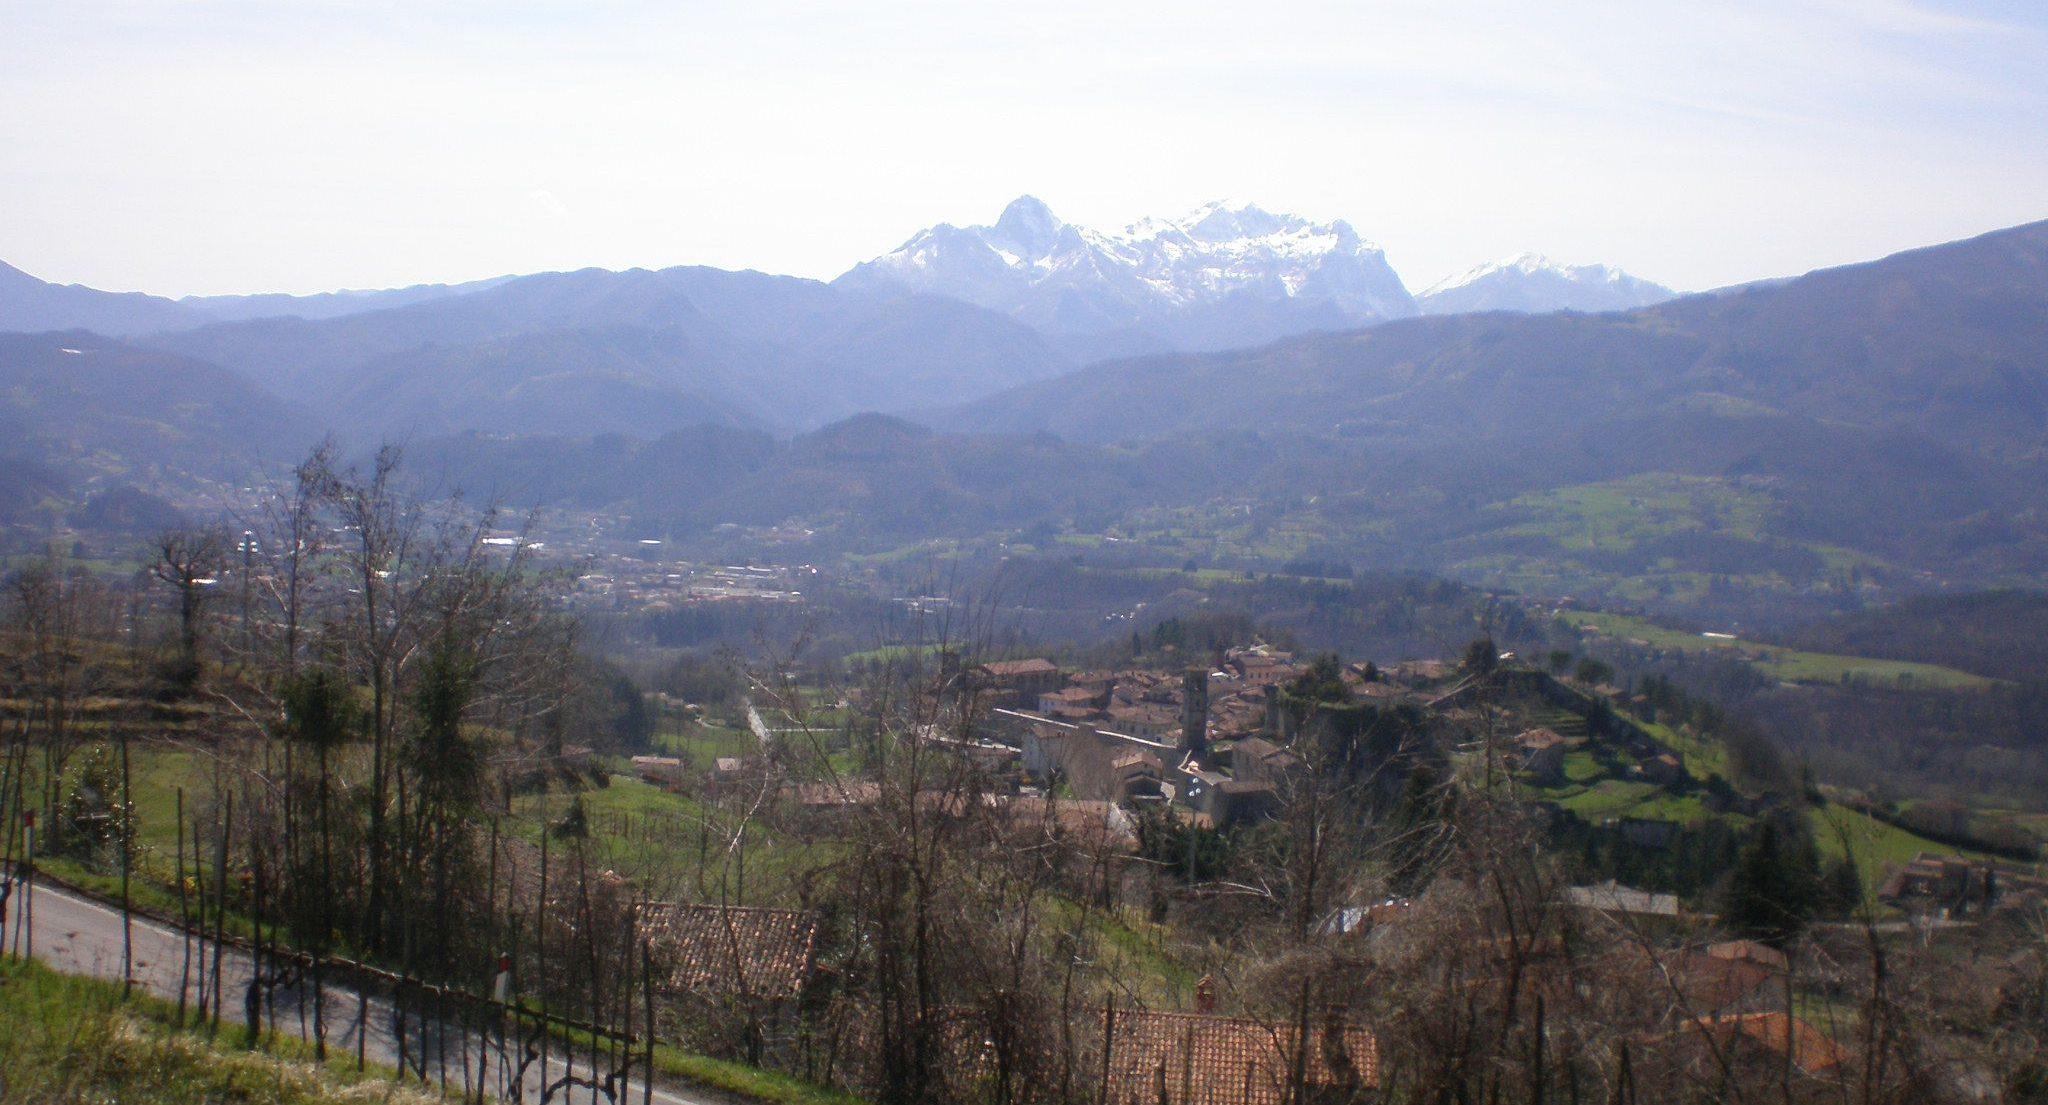 italiainpiega-pieghe meravigliose-itinerari-moto-centro-italia-garfagnana-panorama 3